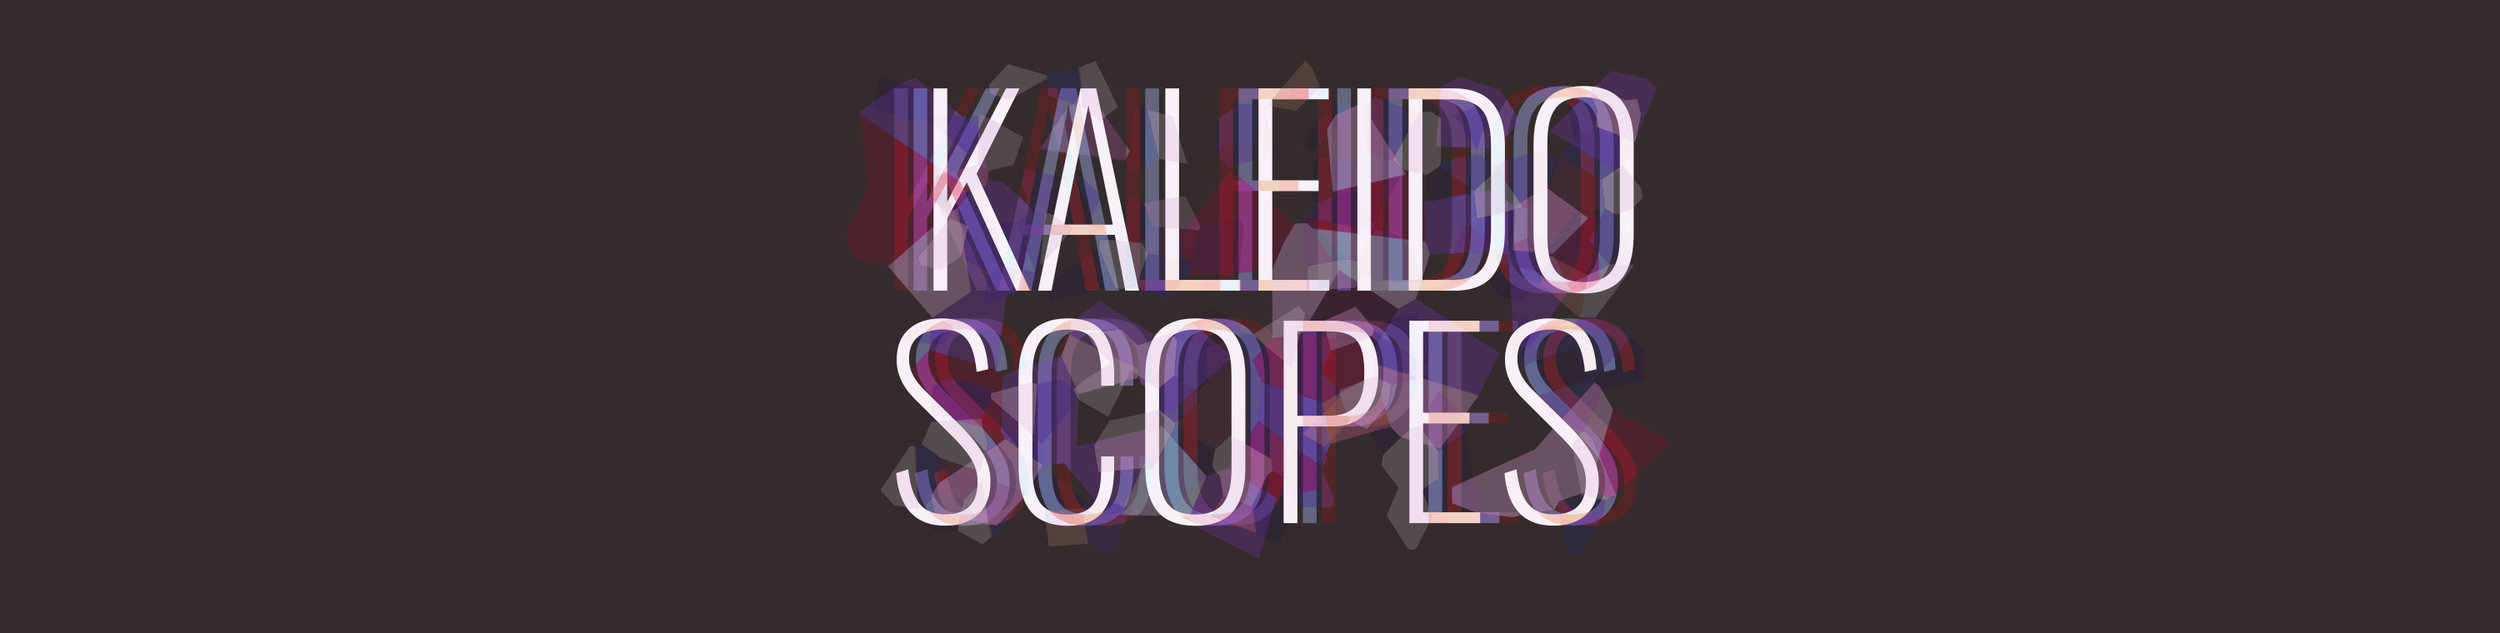 kaleidoscopes3.jpg